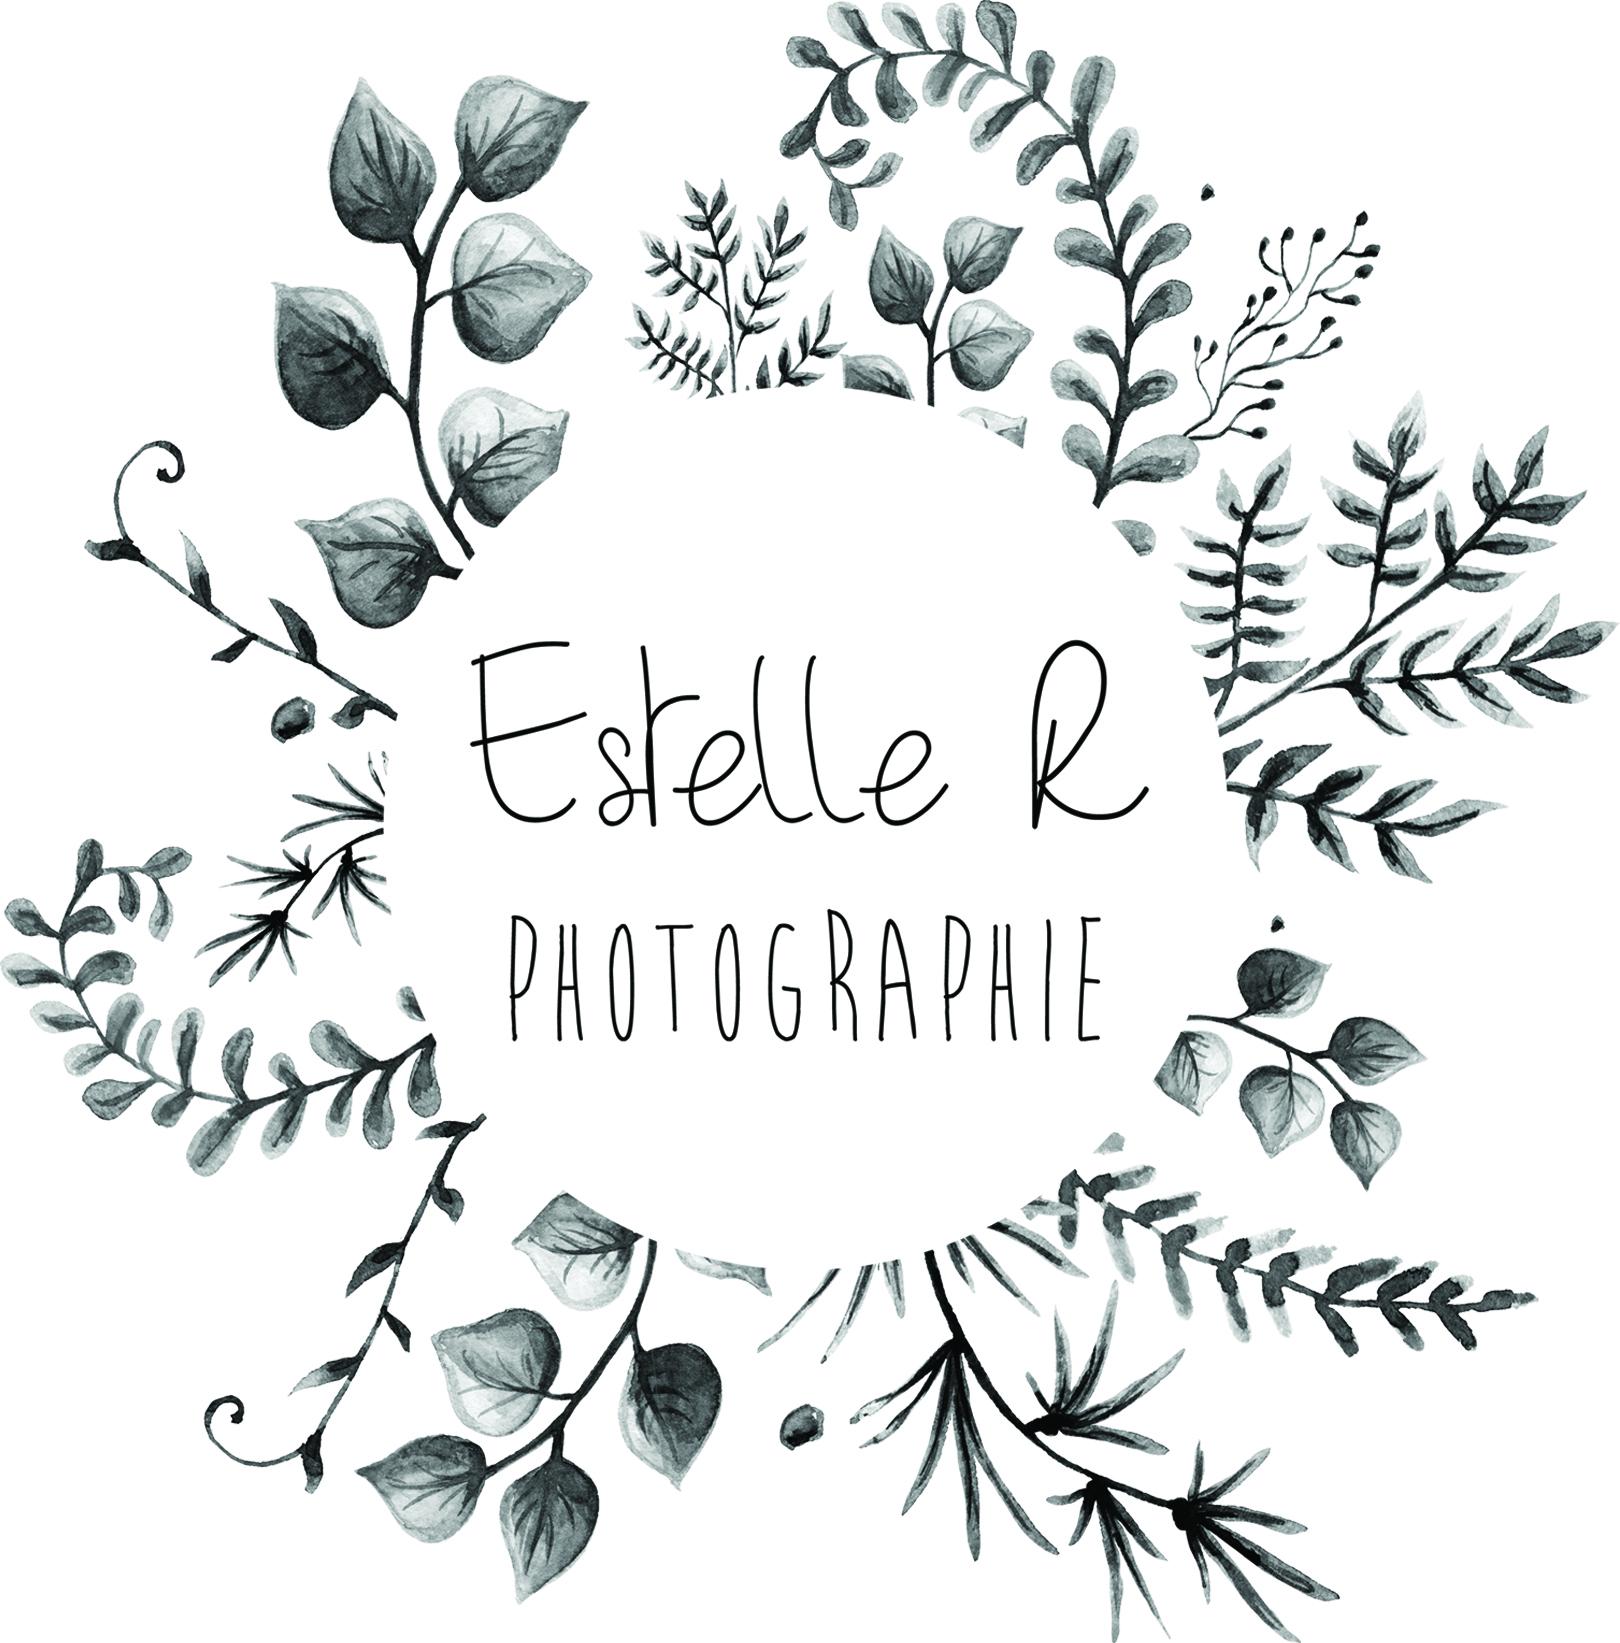 Estelle R photographie – Photographe Mariage & Famille Lifestyle